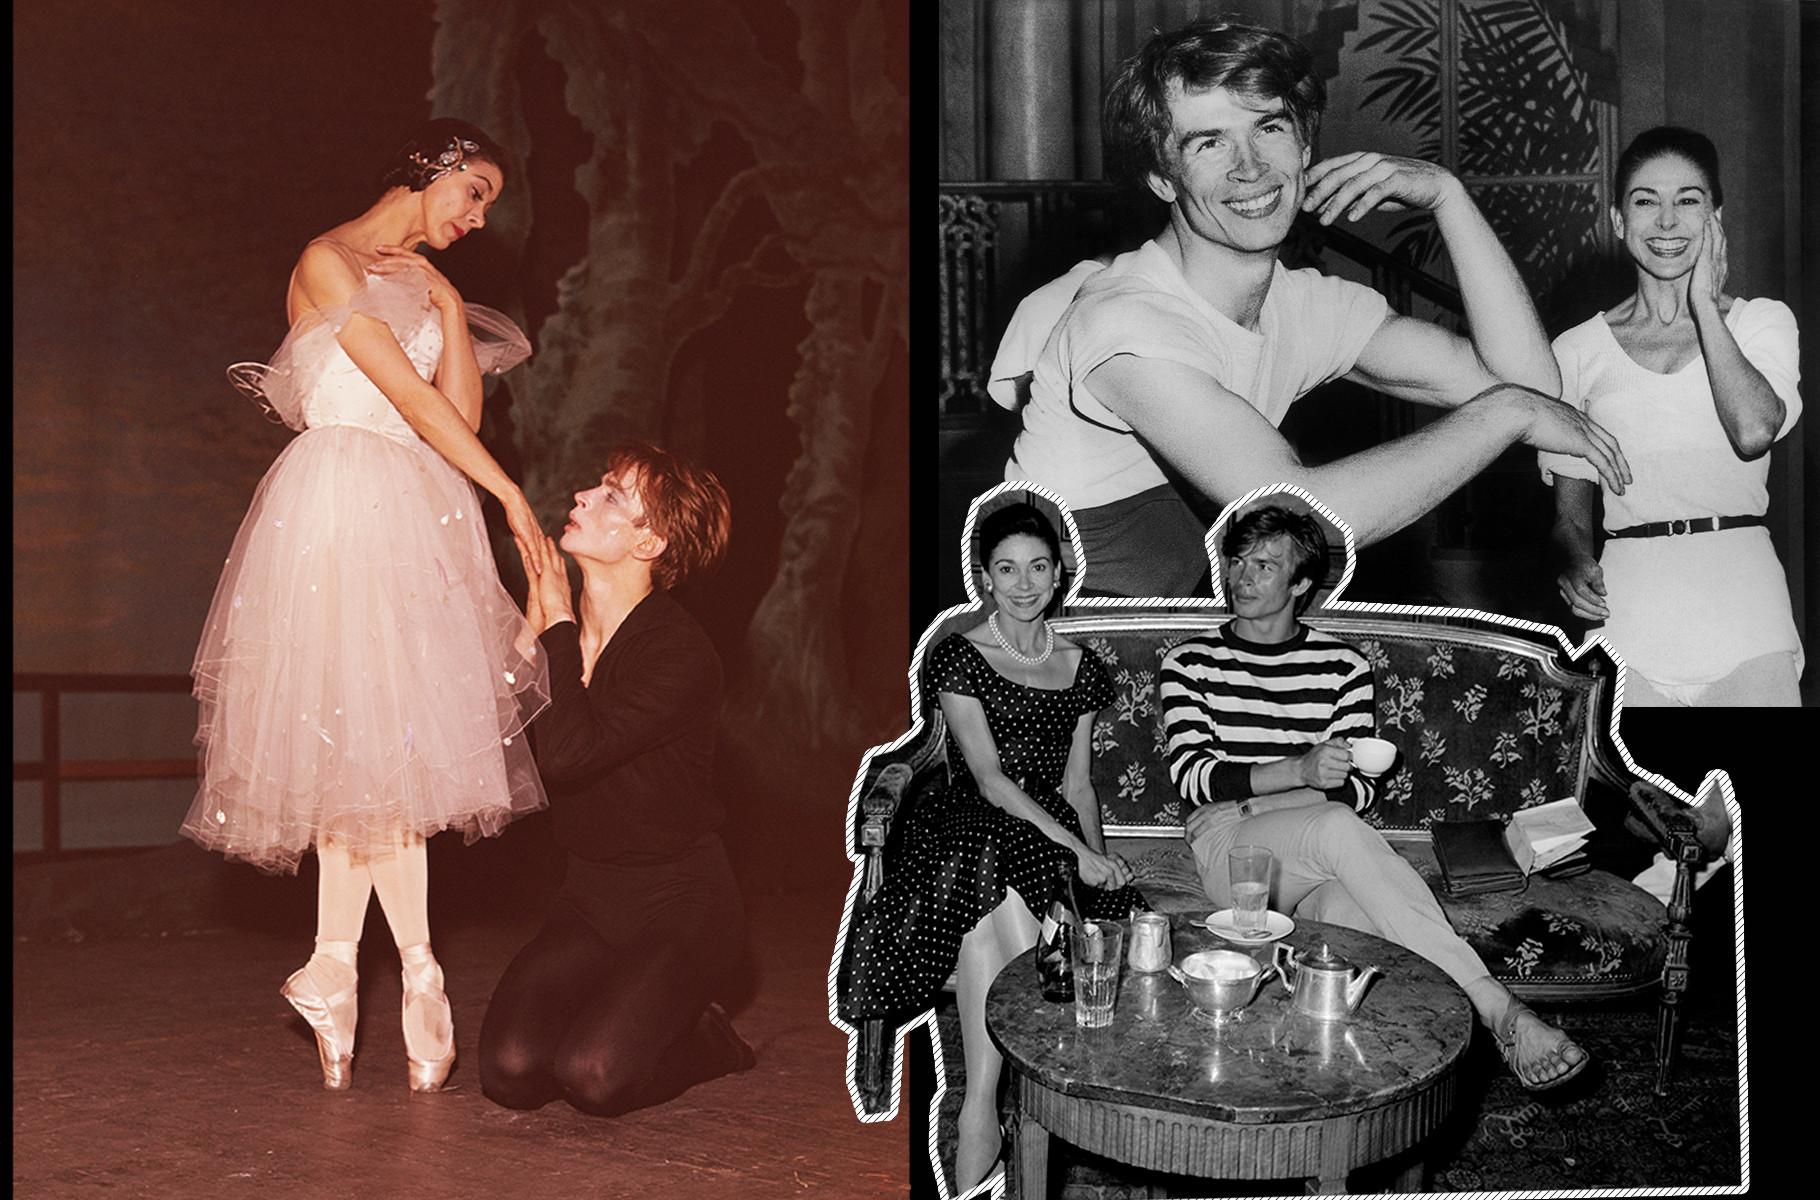 A bailarina inglesa Margot Fonteyn (1919 - 1991) e Nureyev (1938 - 1993) ensaiam 'Giselle' em 1962.